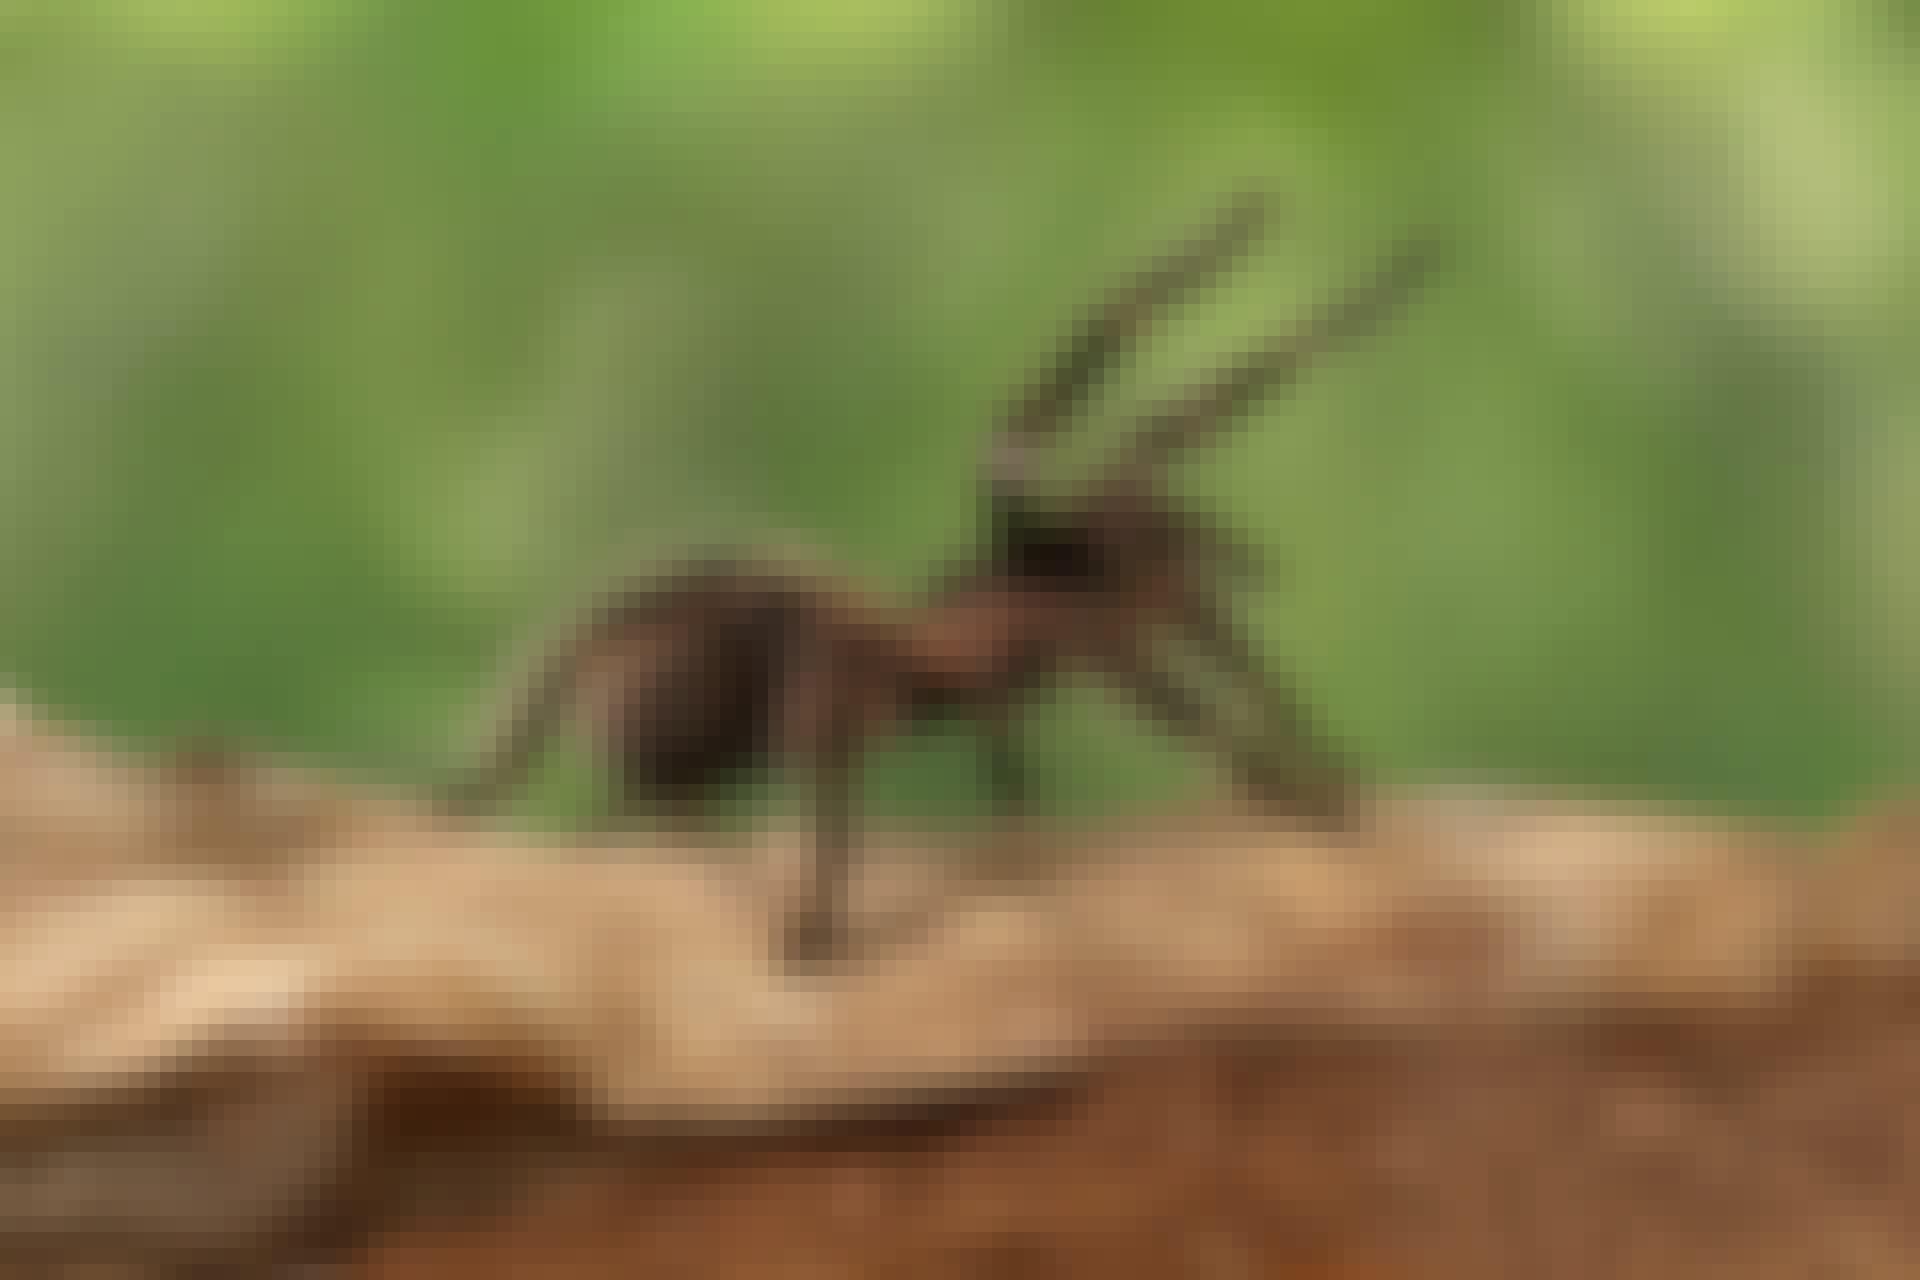 tarantel, lasiodora, Parahybana, fågelspindel, hona